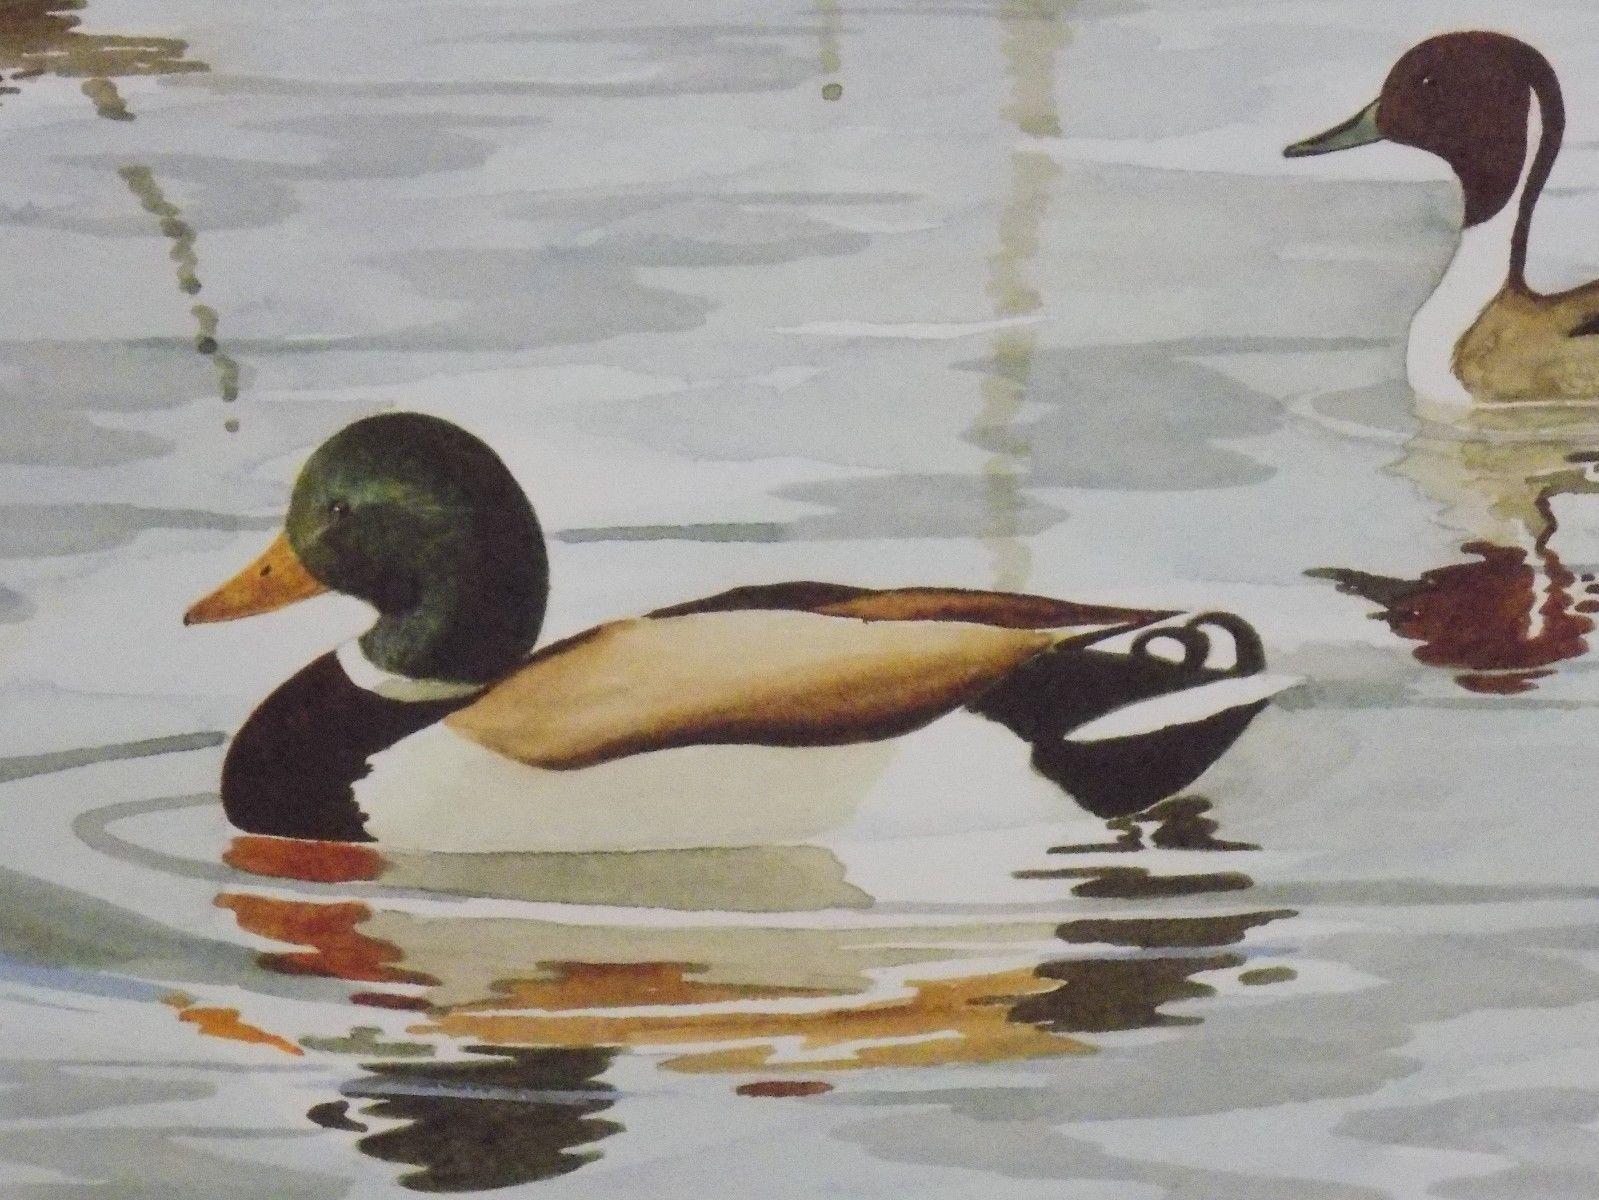 Vintage 1986 Signed ROBERT HILTY ARTIST PROOF #3 Ducks on Water Art Print